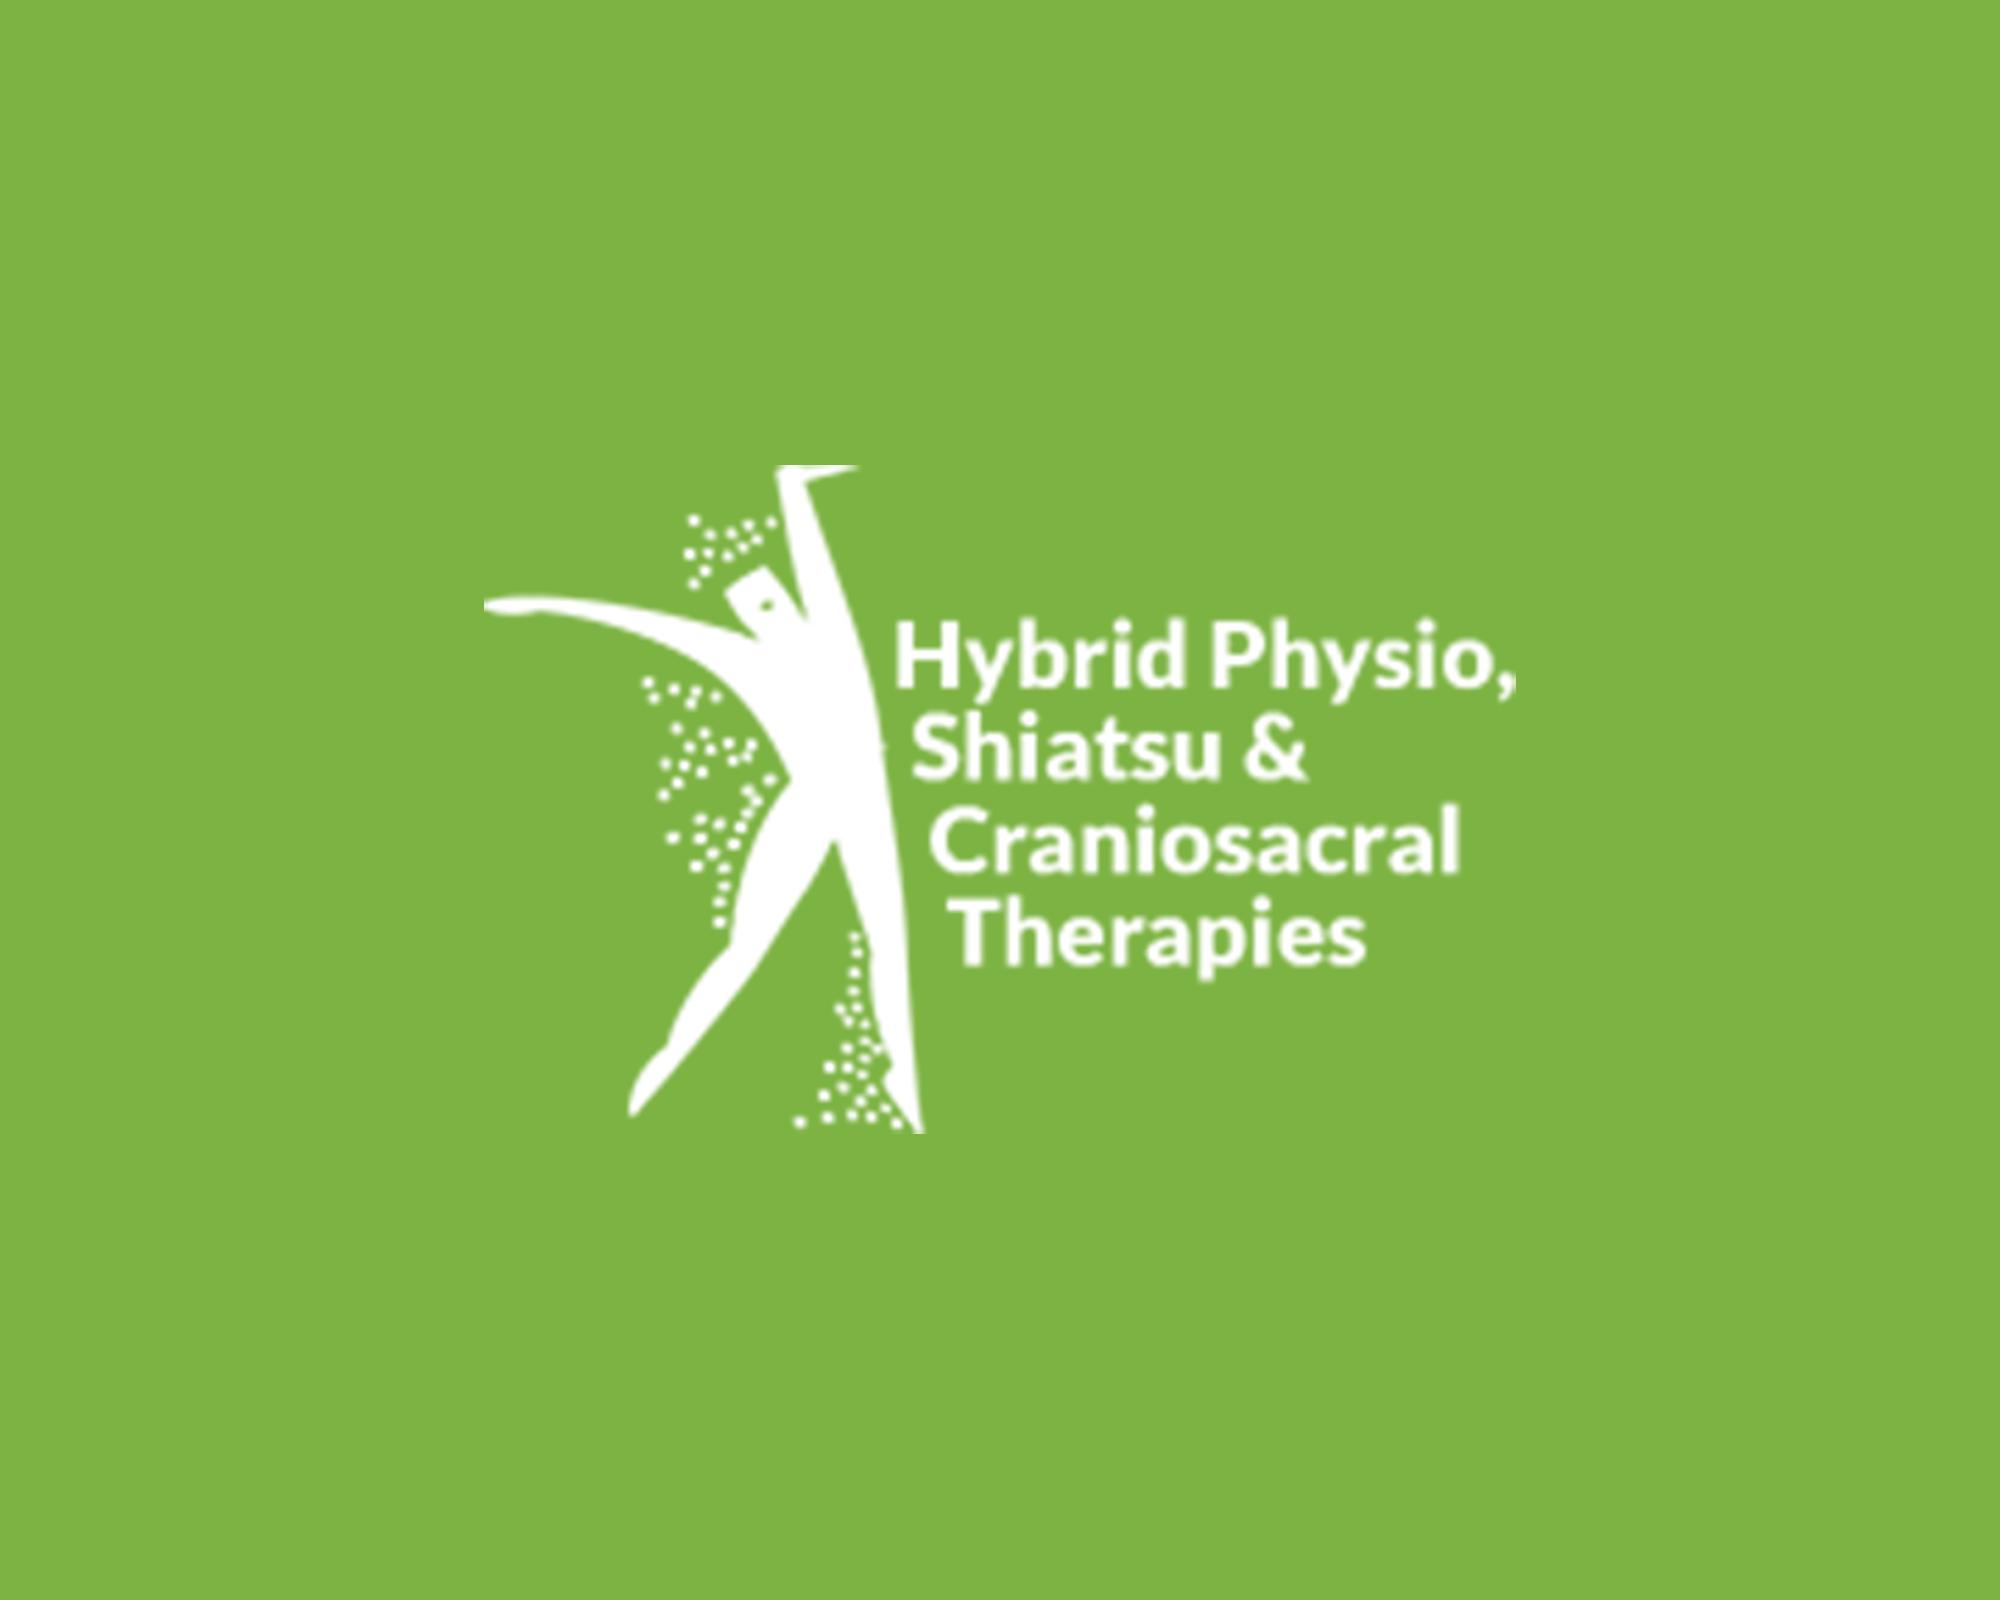 hybrid physio, shiatsu & craniosacral therapies Logo